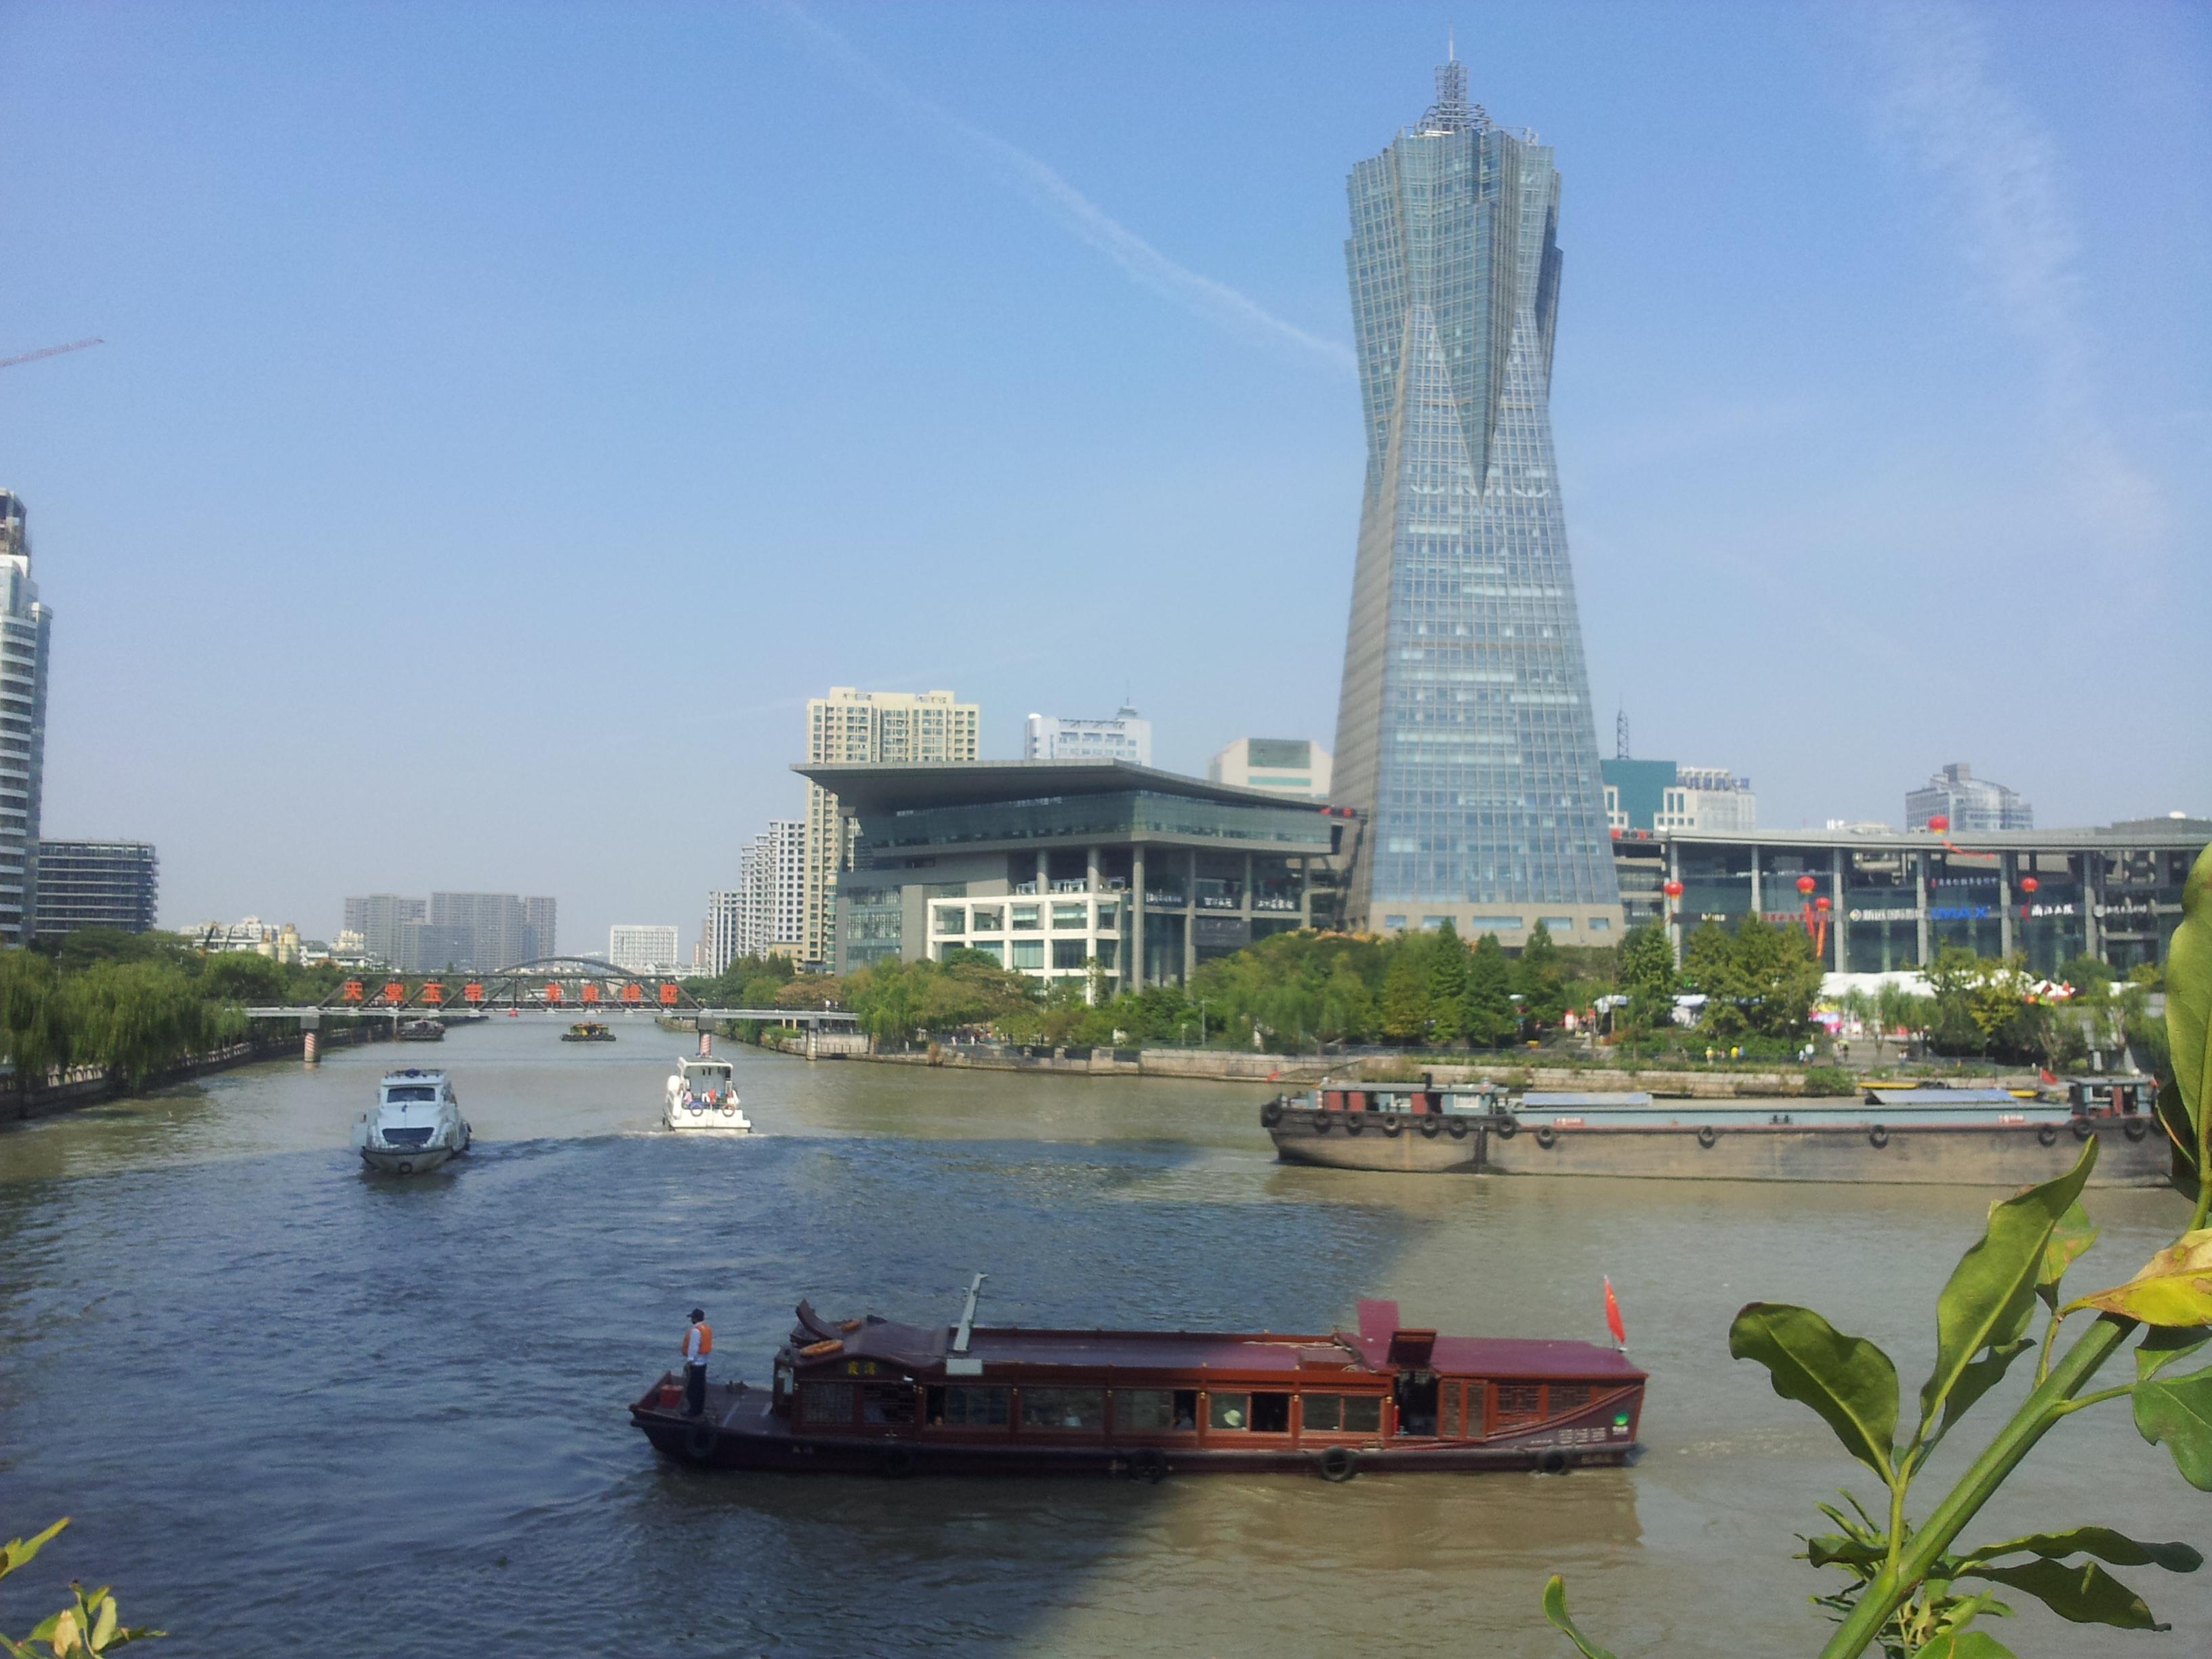 Grand canal, West Lake Cultural Square, Hangzhou